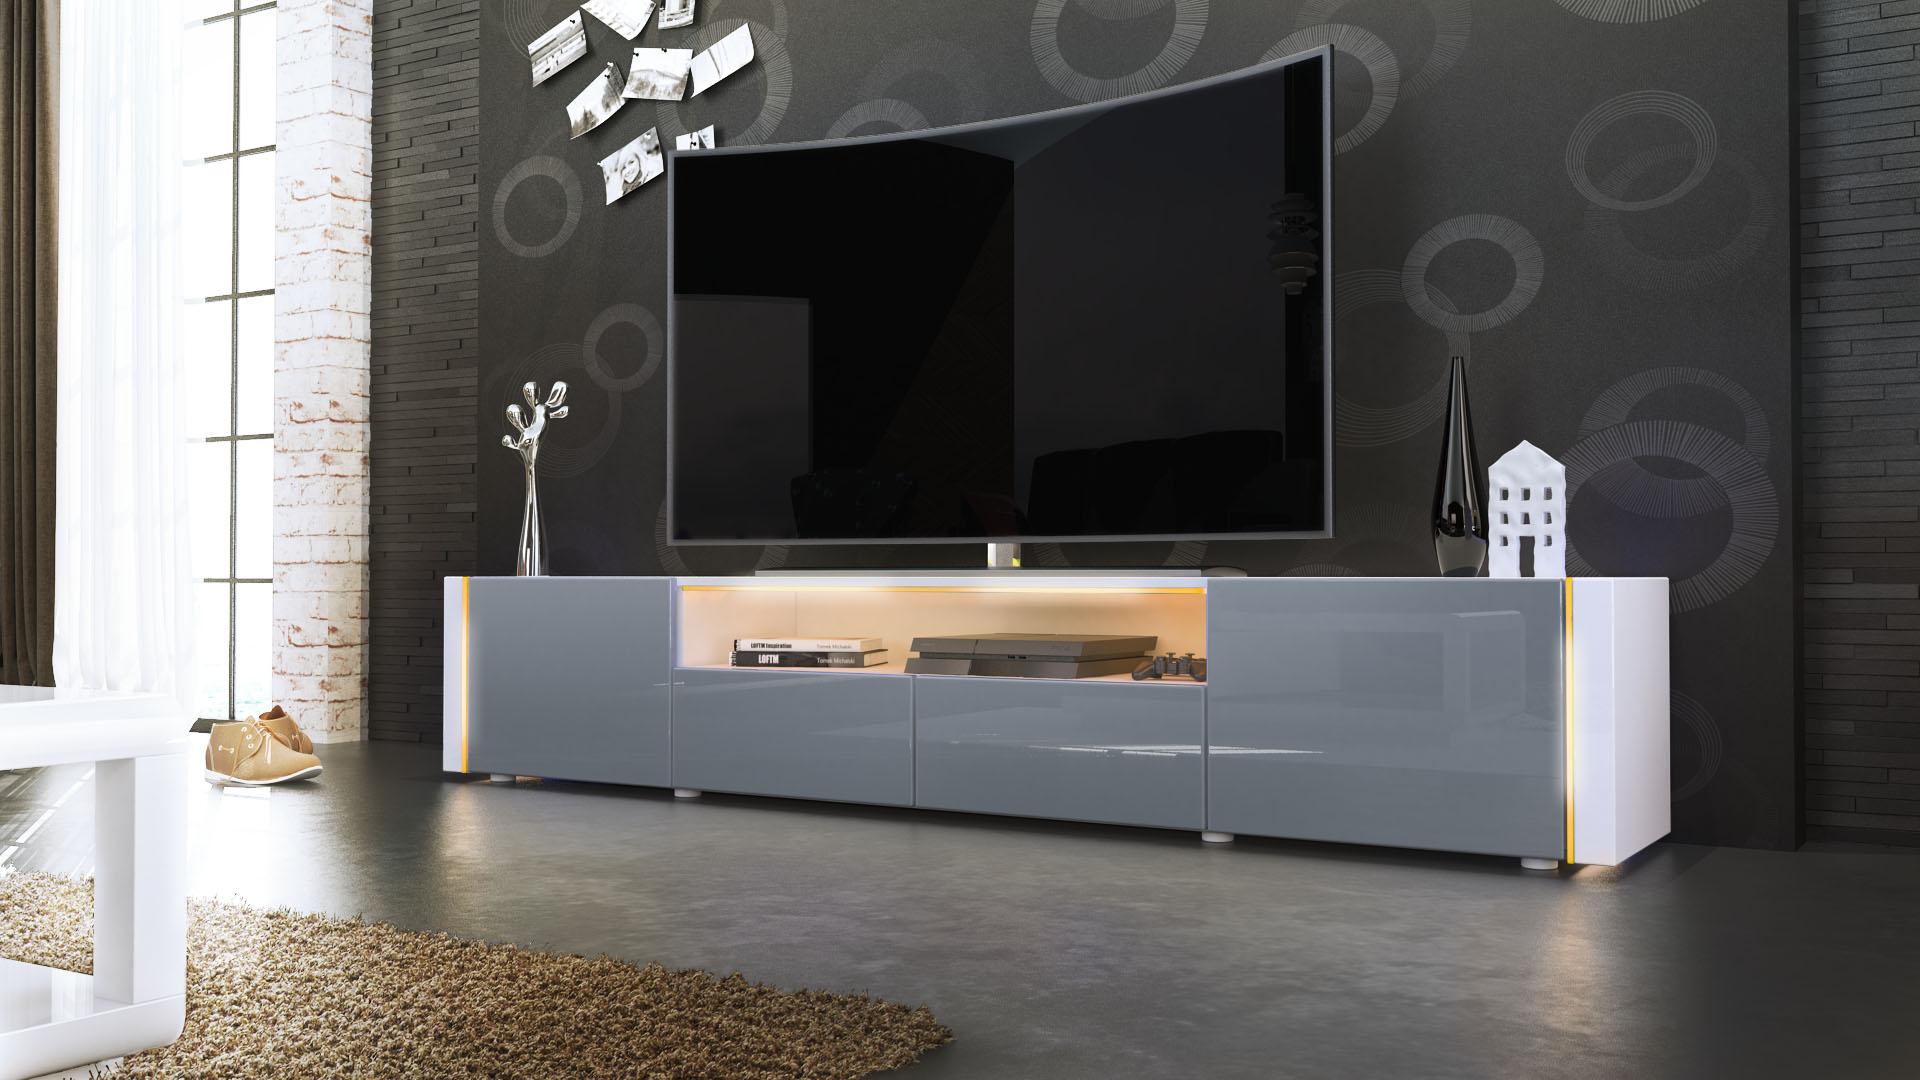 tv lowboard fernseh board schrank tisch m bel rack marino. Black Bedroom Furniture Sets. Home Design Ideas